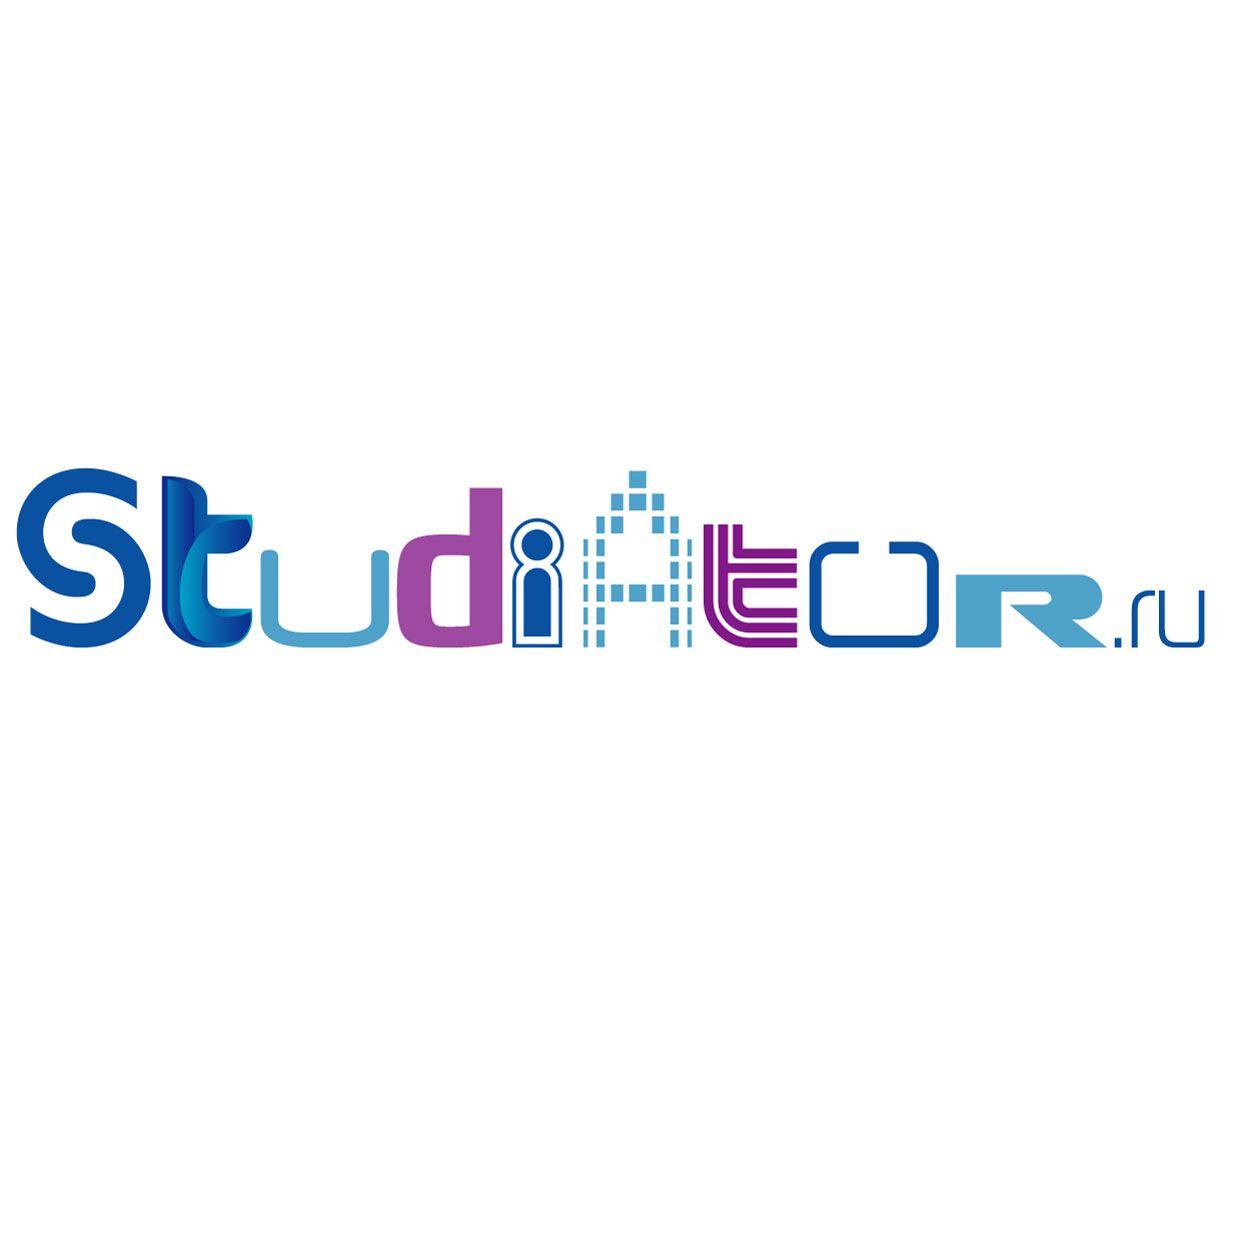 Логотип для каталога студий Веб-дизайна - дизайнер zhutol